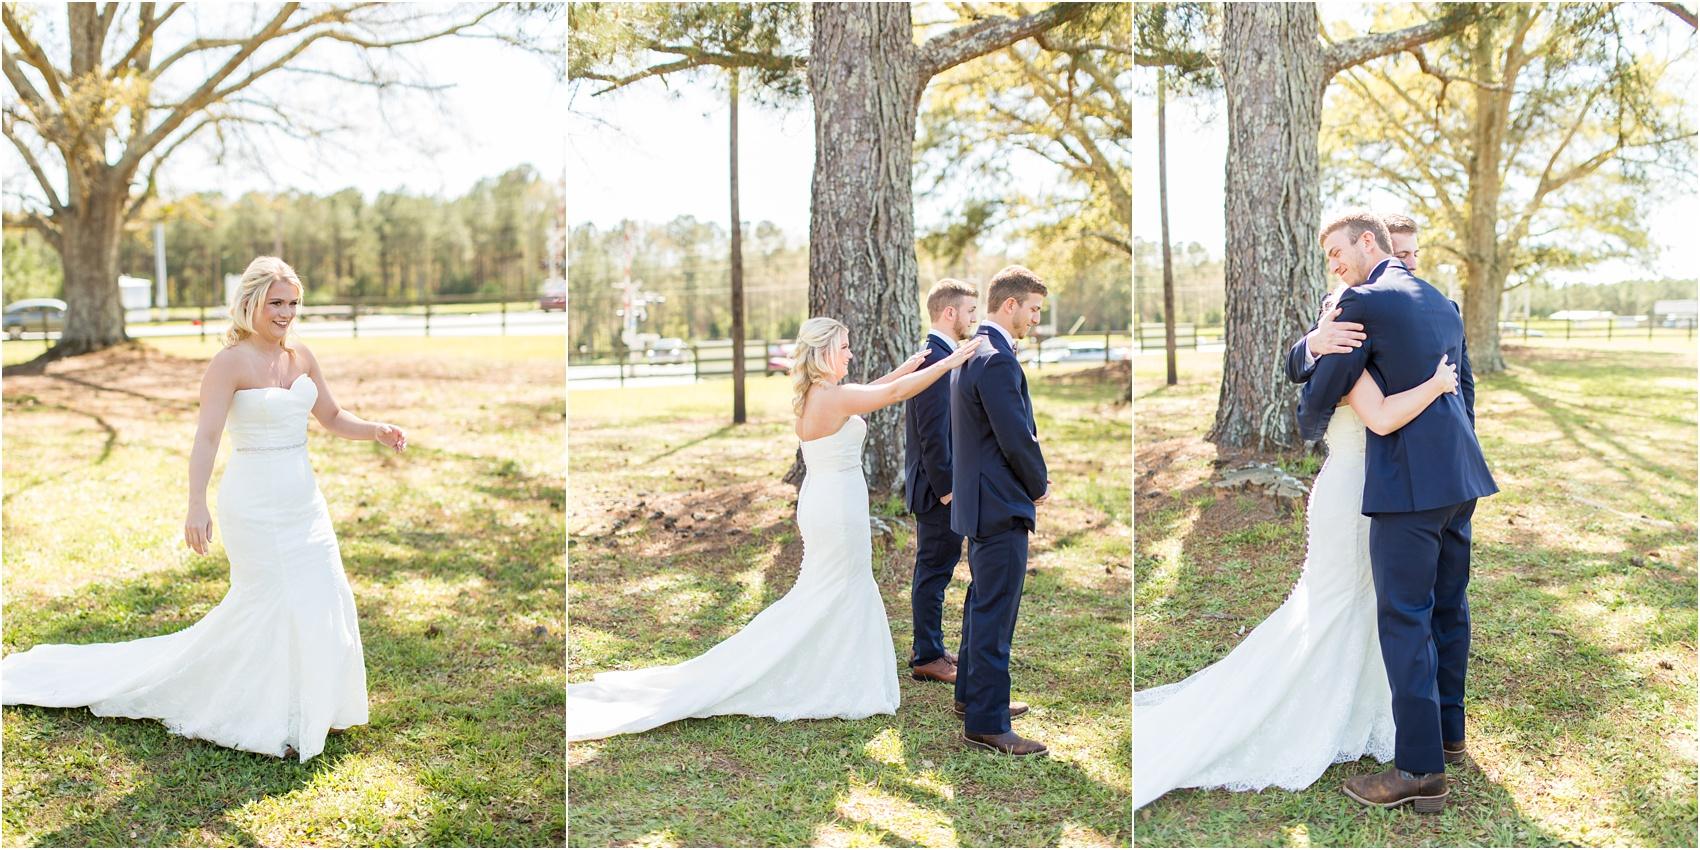 Savannah Eve Photography- Wade Wedding-14.jpg